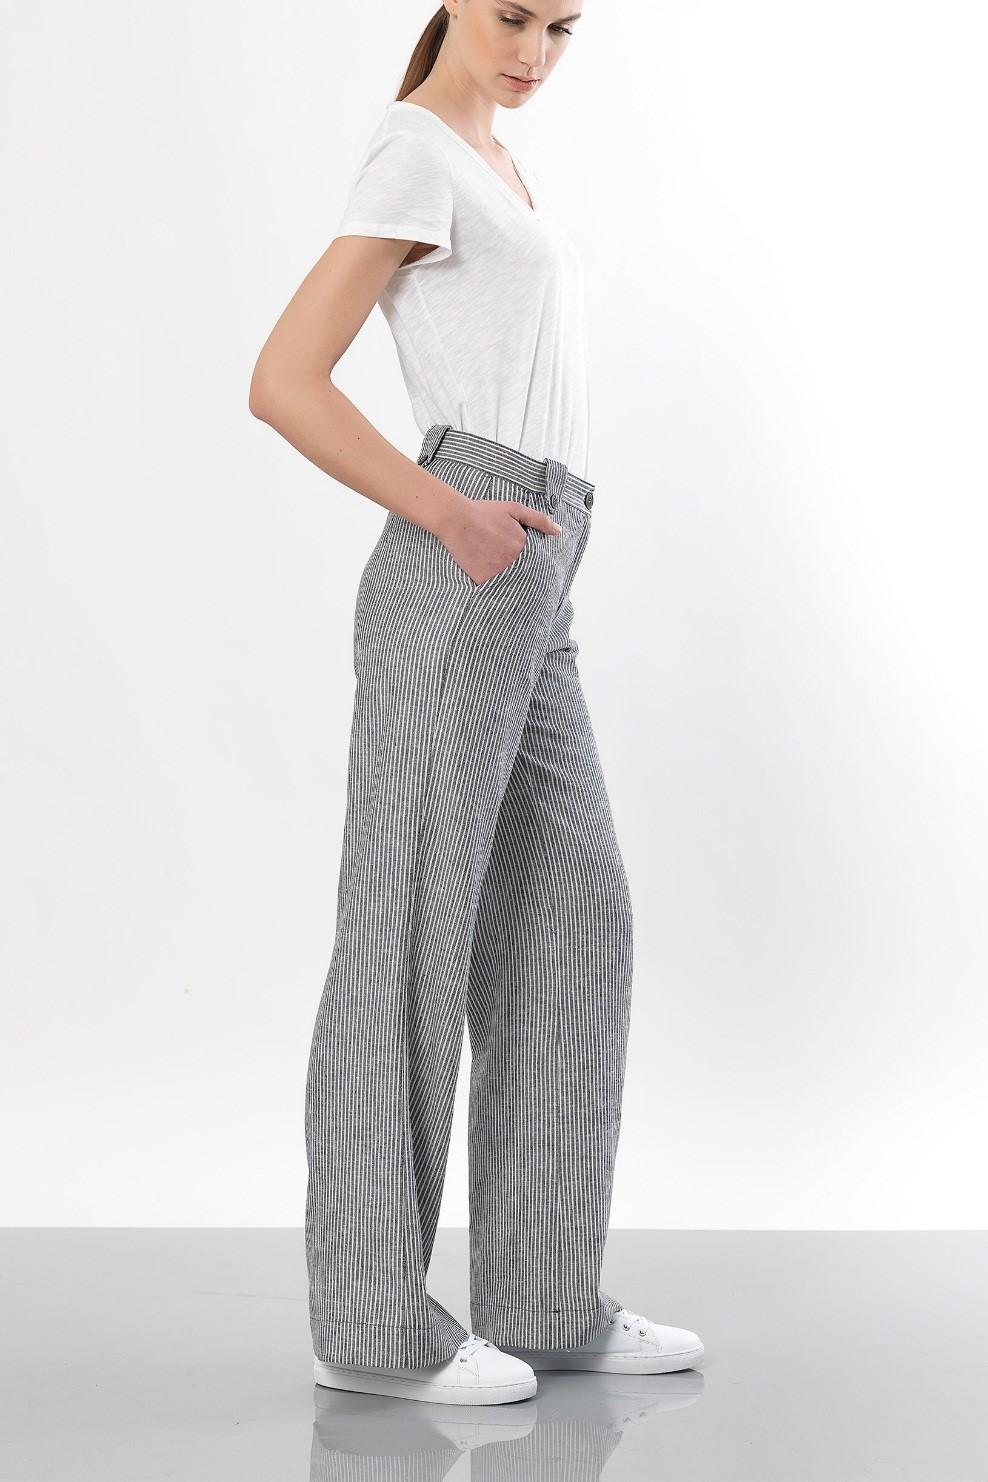 ca7cf9459cb Spring Collection στο Bill Cost – Τα γυναικεία ρούχα που όλες ...